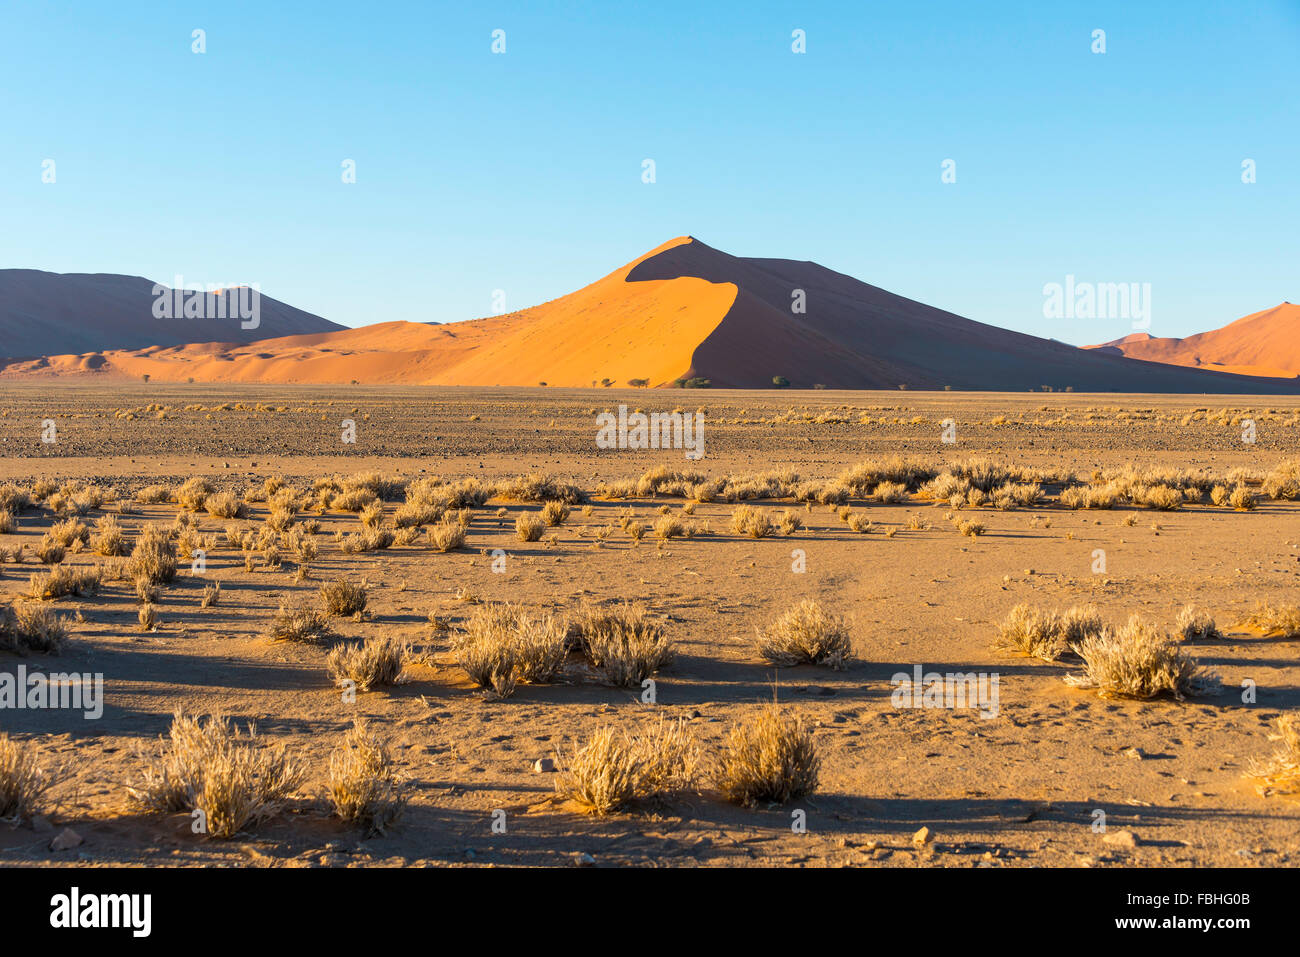 Sand dunes, Sossusvlei, Namib Desert, Namib-Naukluft Park, Hardap Region, Republic of Namibia - Stock Image